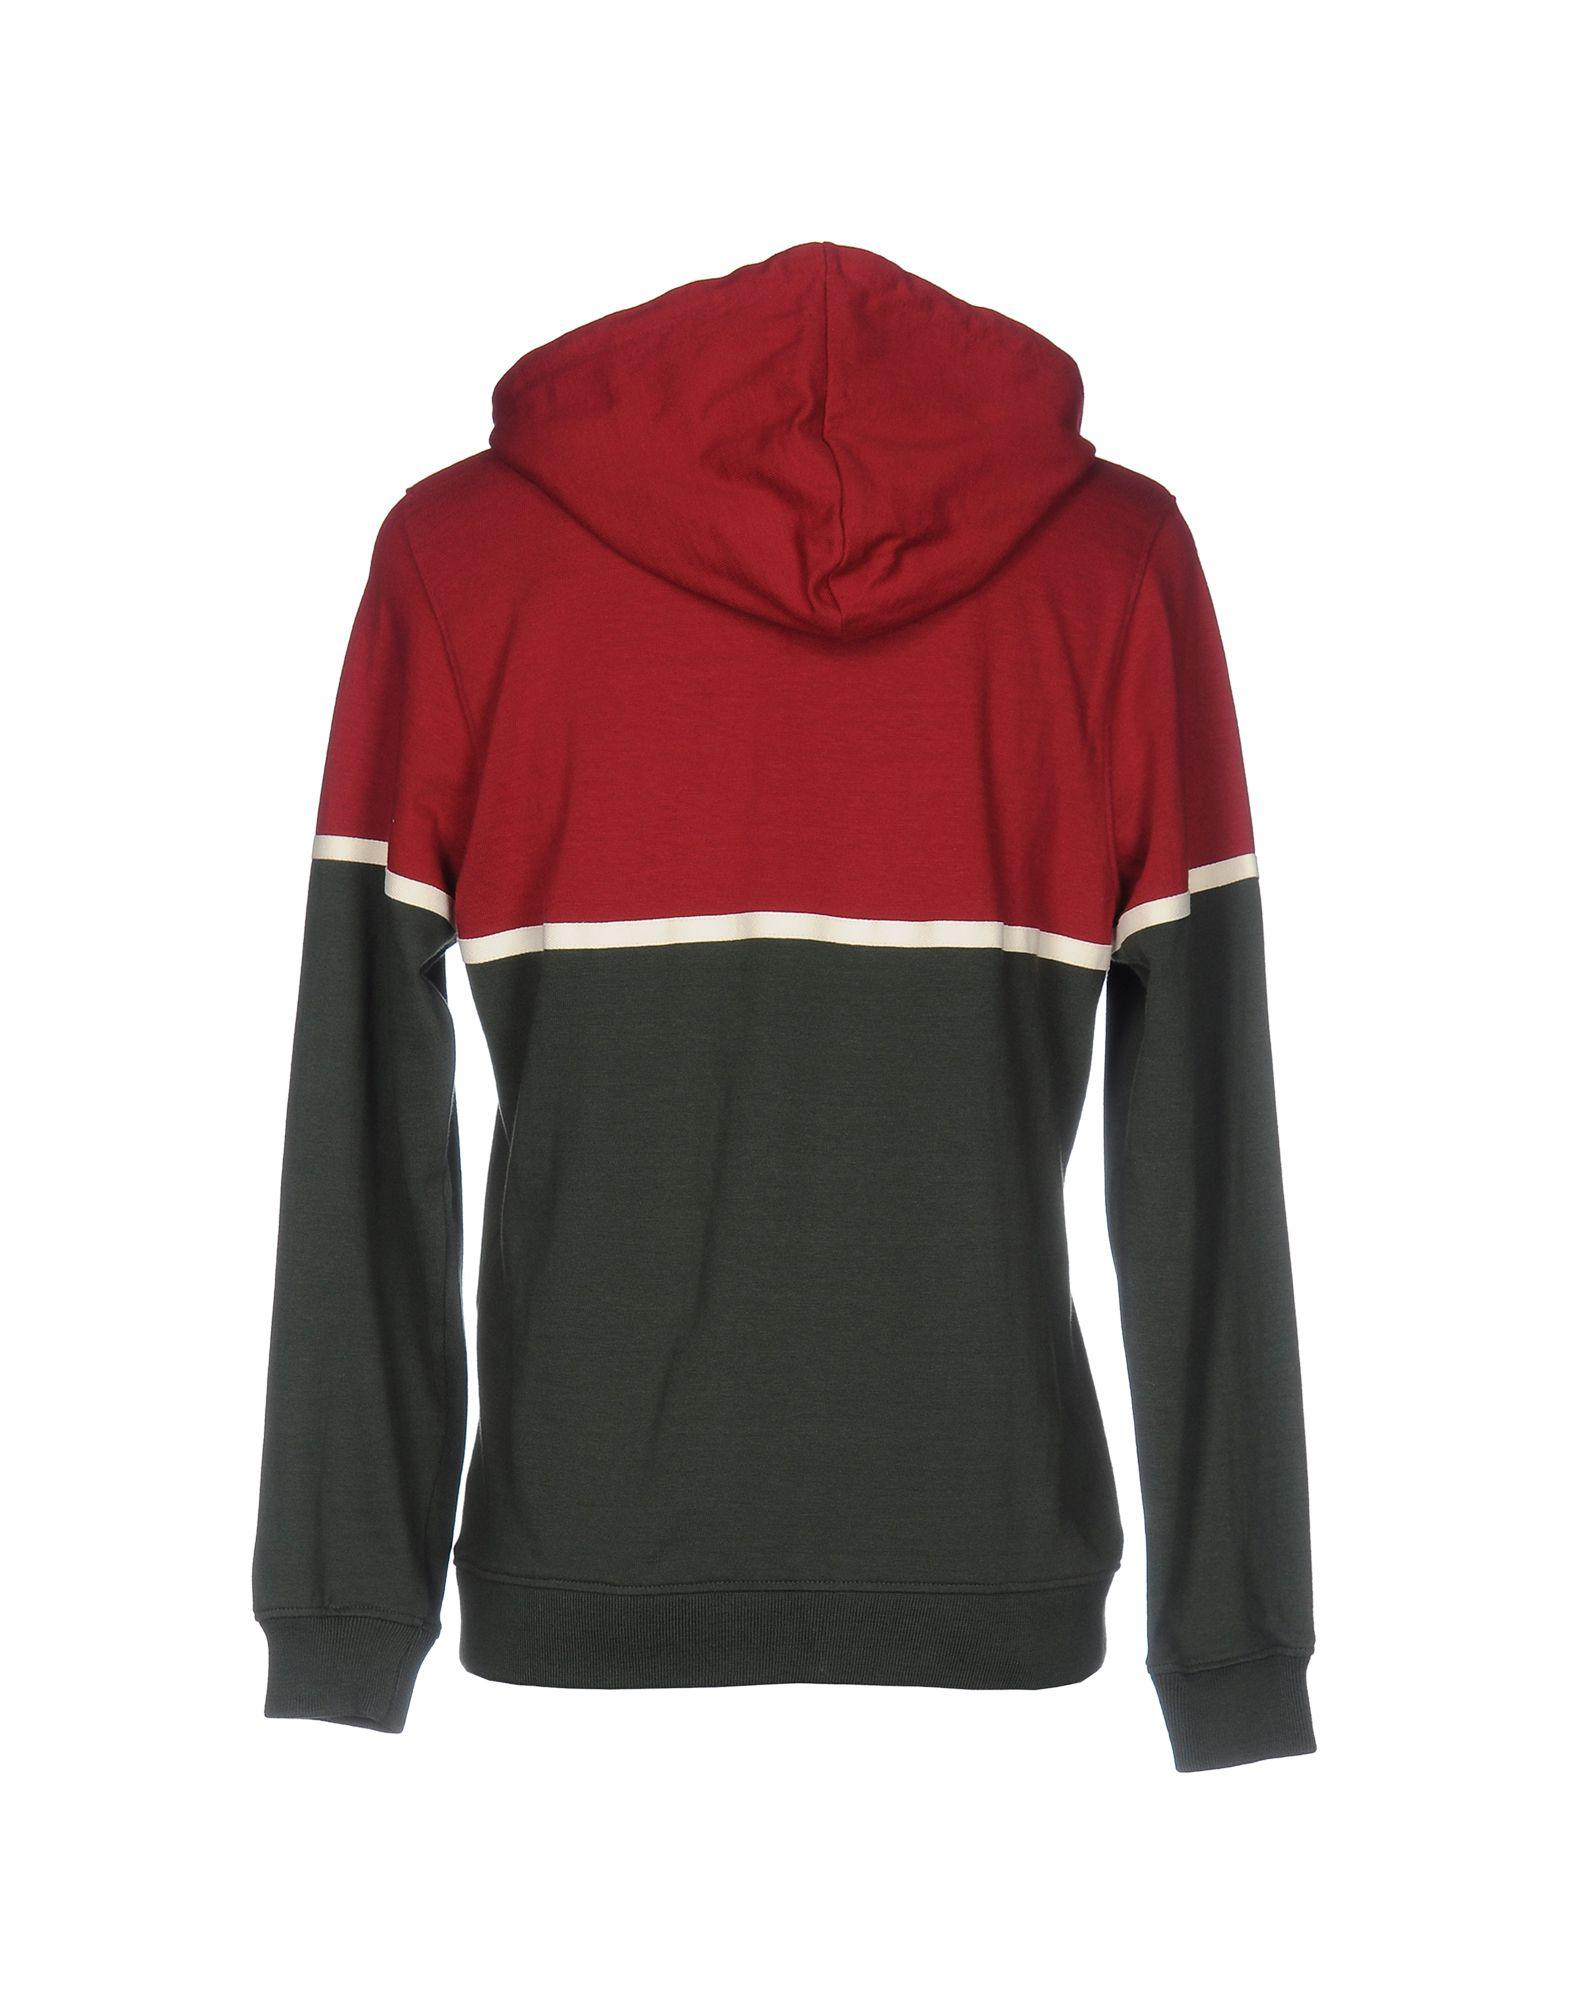 Lyst Sudadera Hombre Rojo Color De Stussy wH0qwOzv 12098ae7b8b63